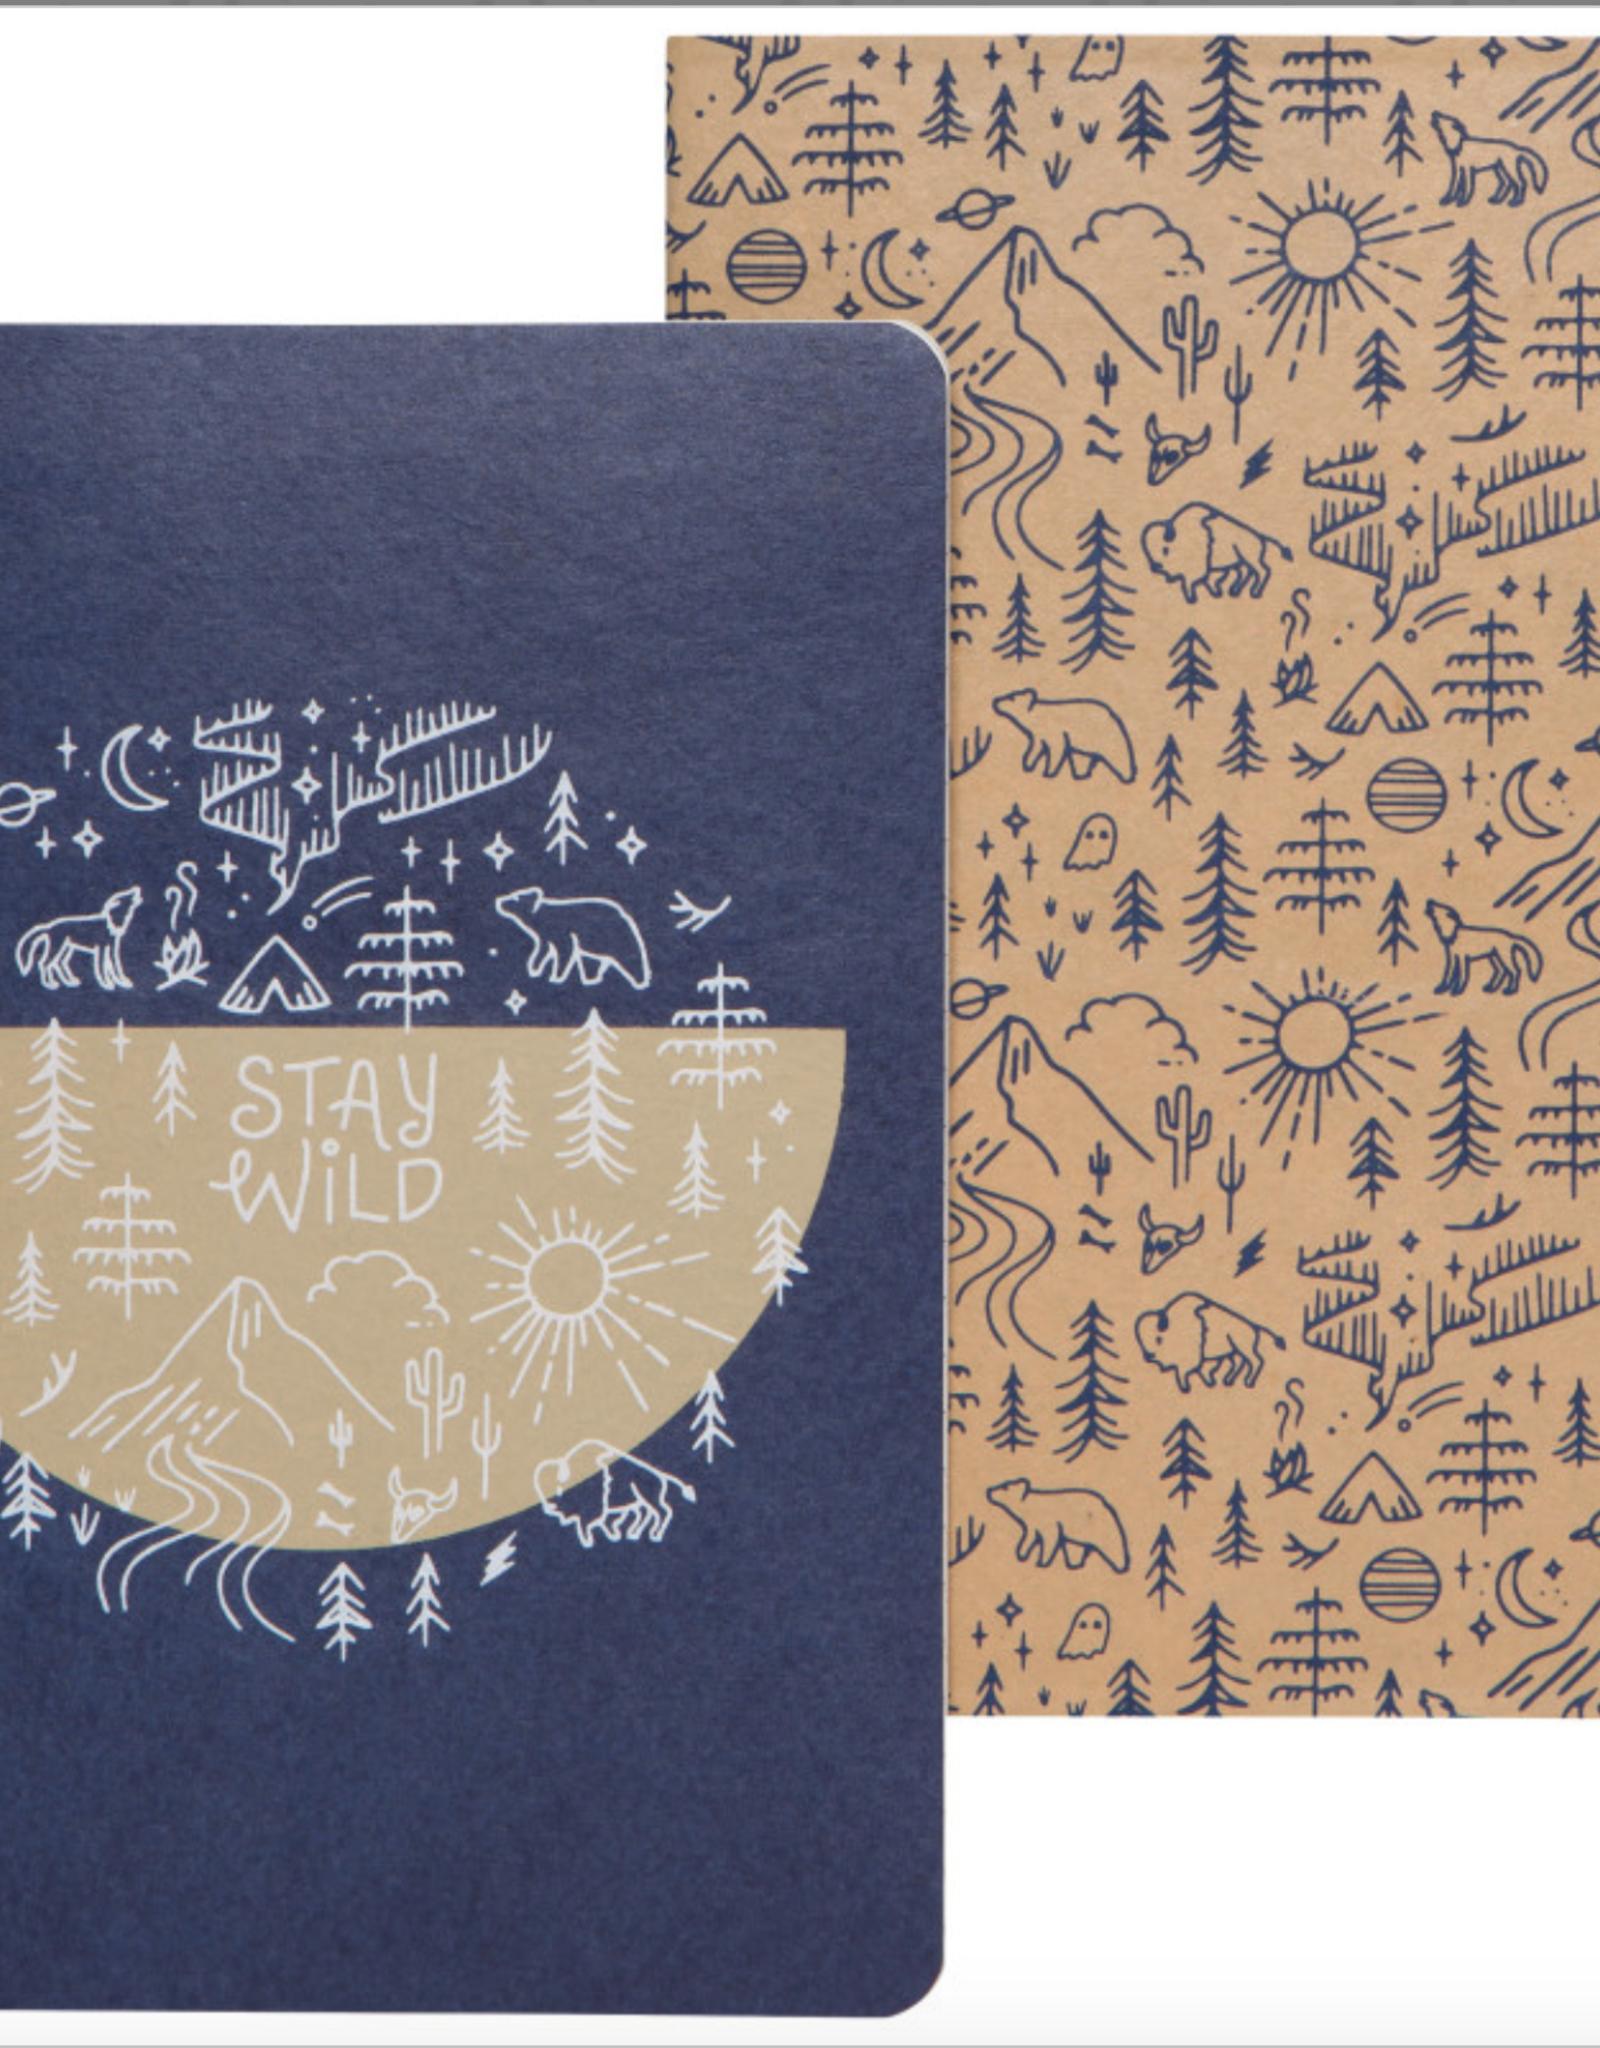 Danica Danica-Cahier de notes Stay Wild